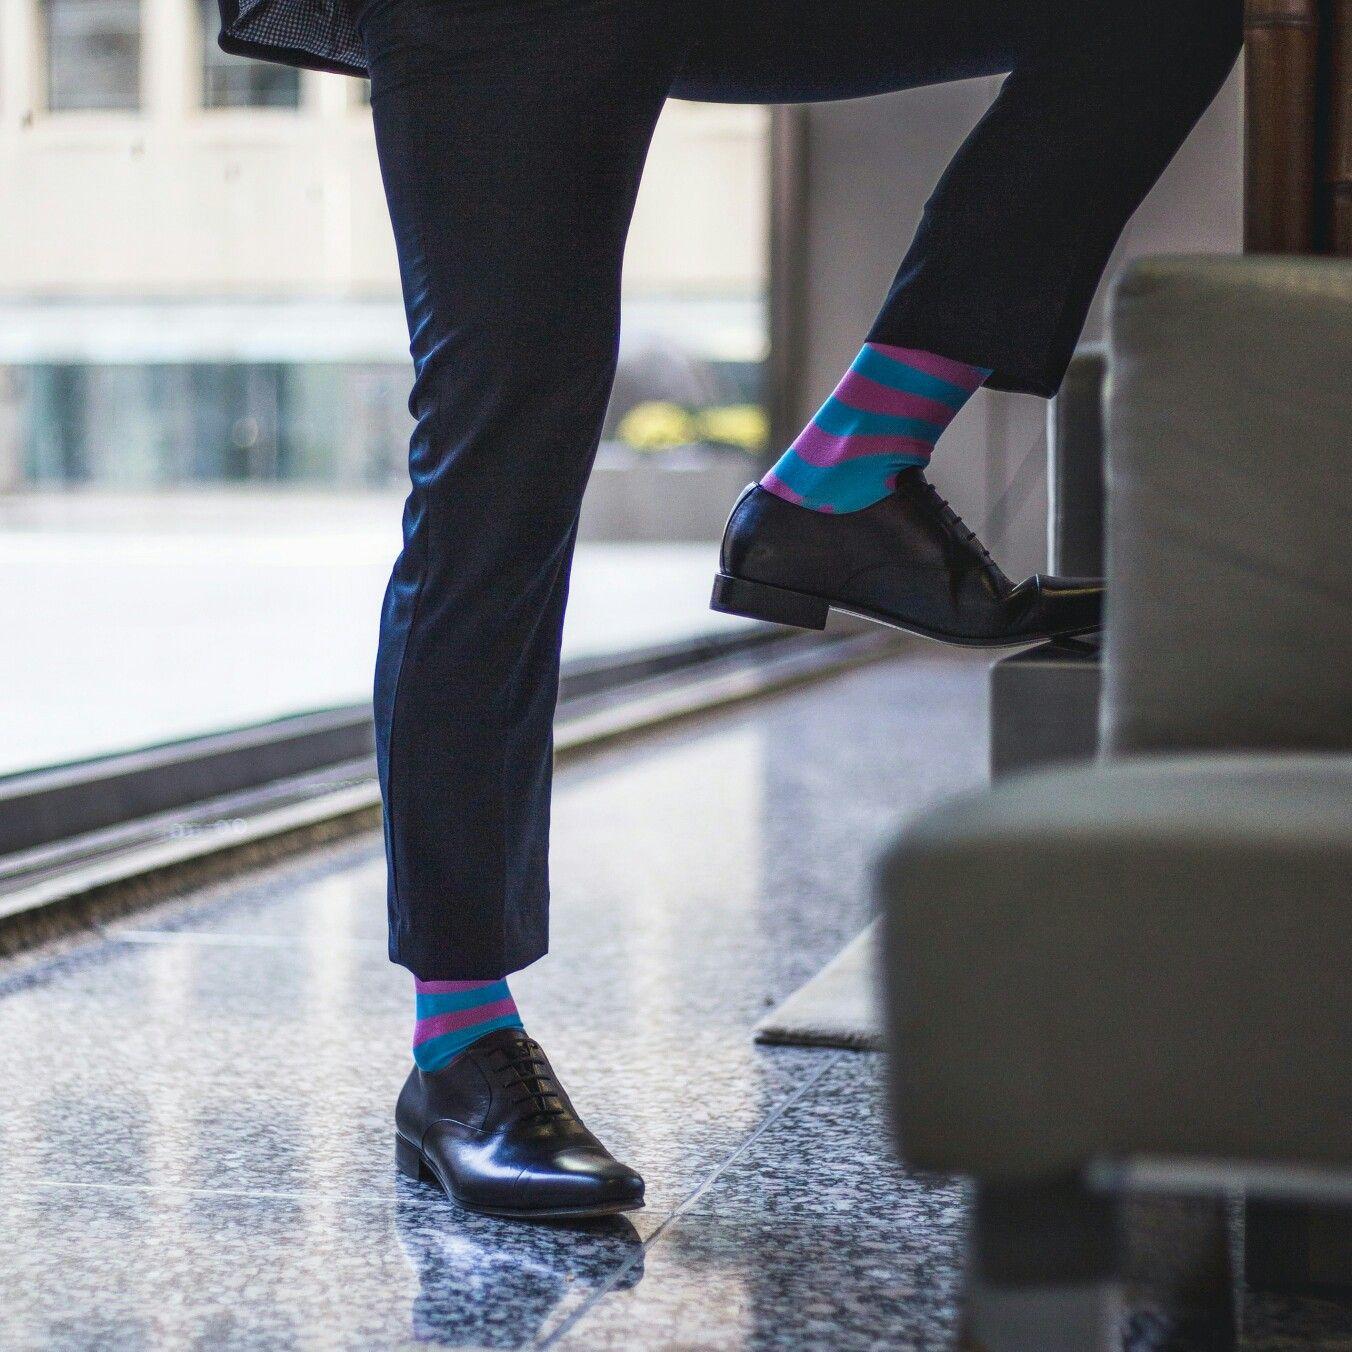 Premium Bamboo Socks / Colorful Socks / Groomsmen Socks / Wedding Socks / Dress Socks / Happy Socks / Fathers Day Gift / Gift For Dad oq2nv70fuk